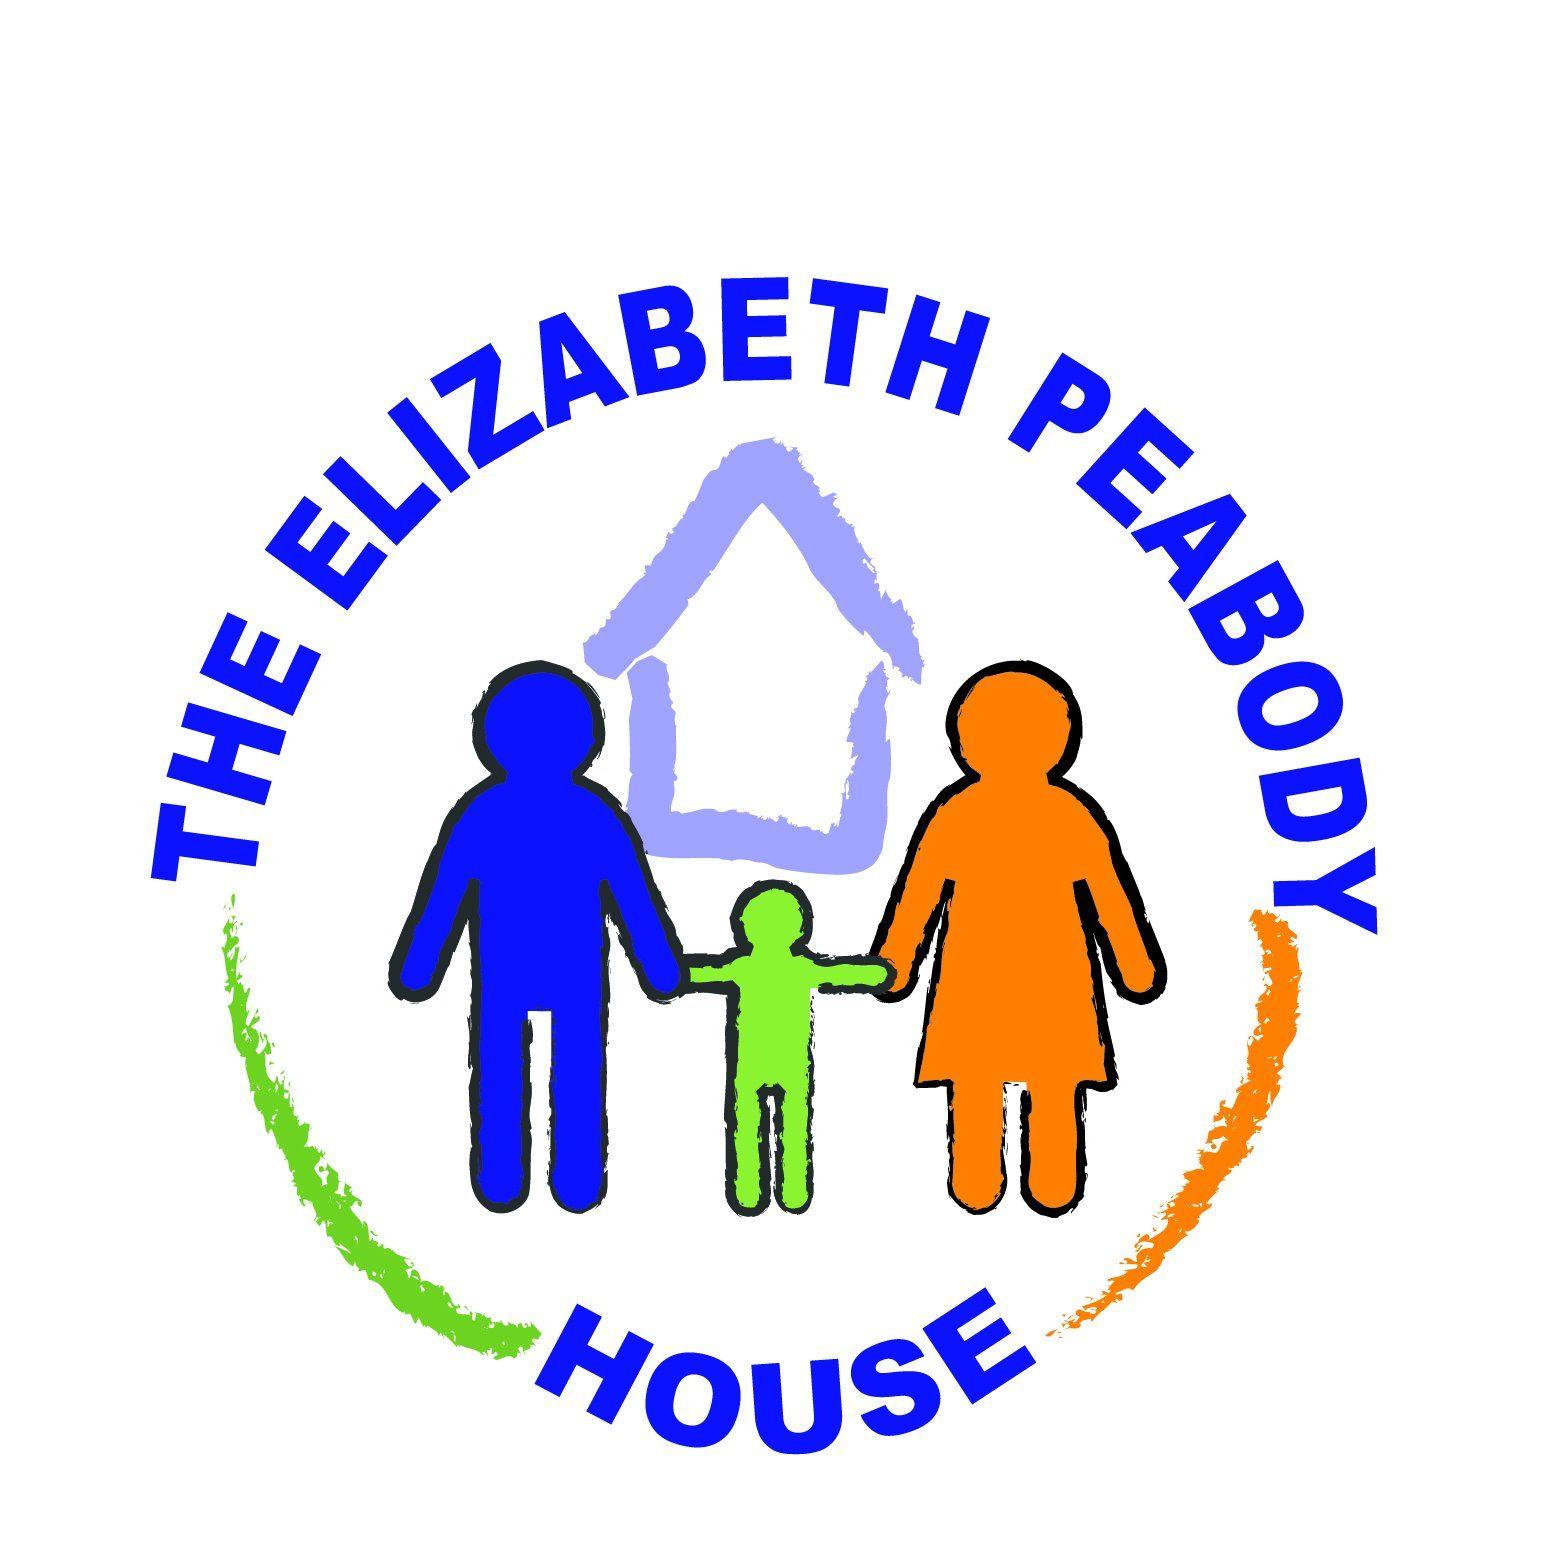 The Elizabeth Peabody House